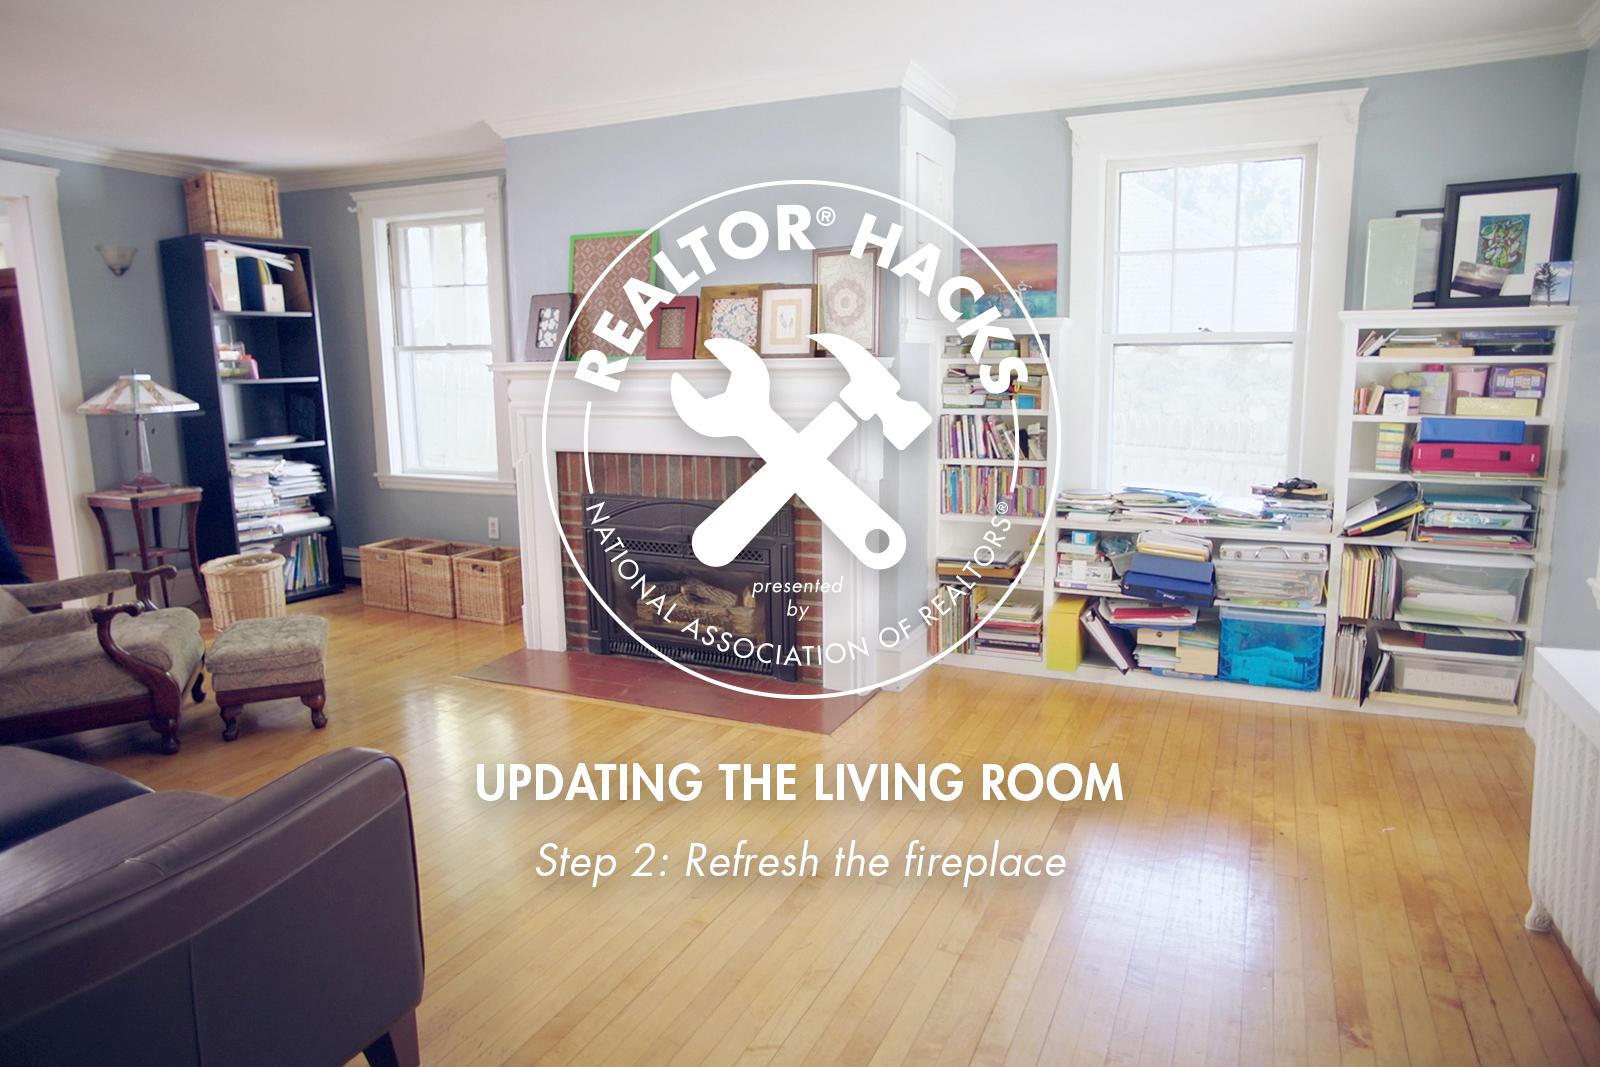 Realtor® Hacks: Updating the Living Room, Step 2